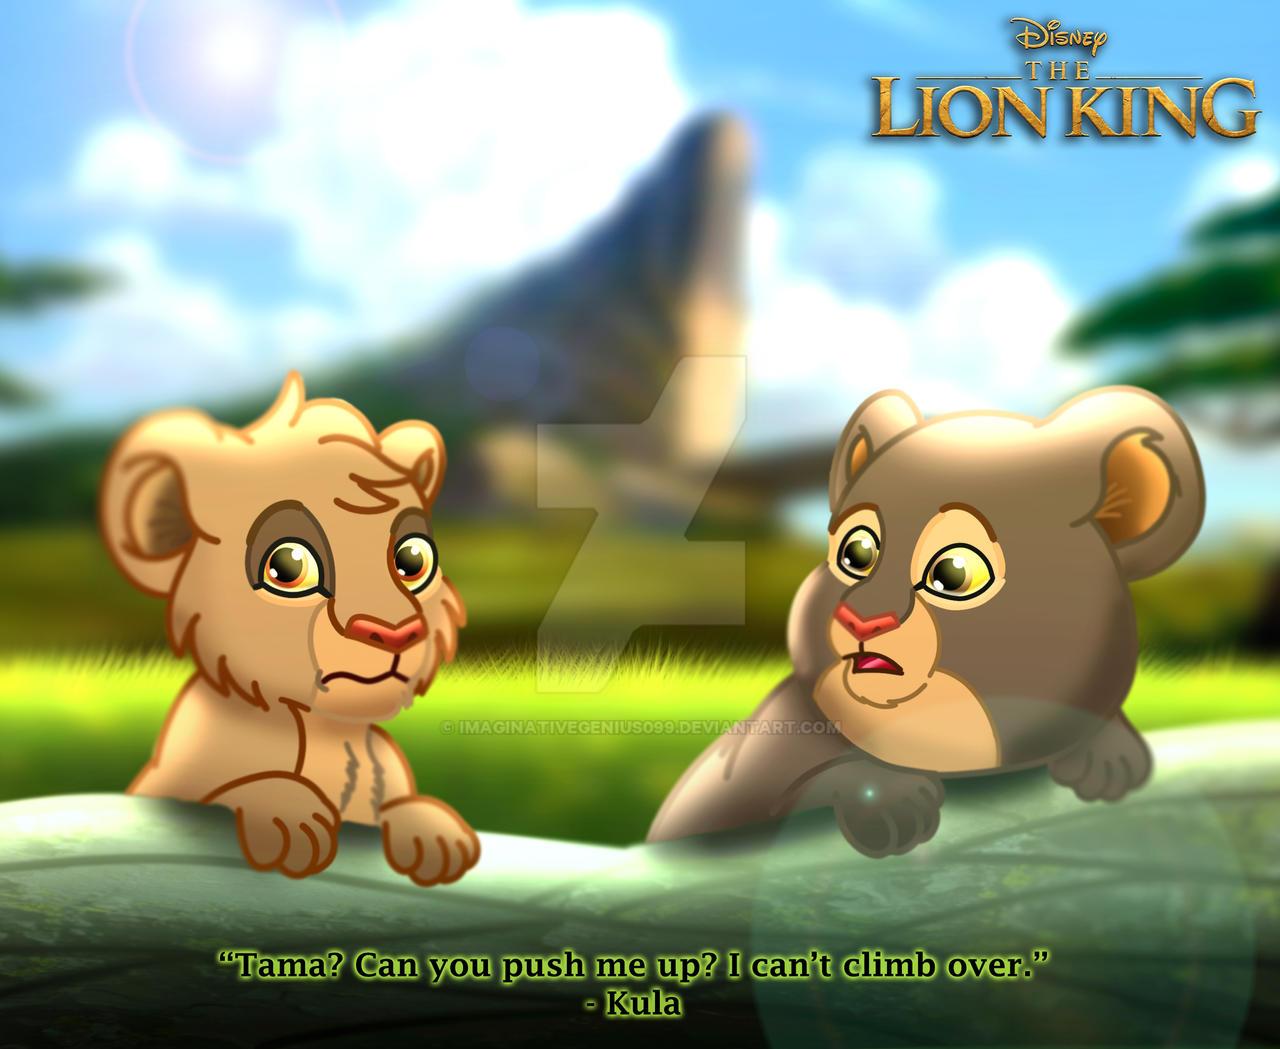 The Lion King Tama And Kula By Imaginativegenius099 On Deviantart